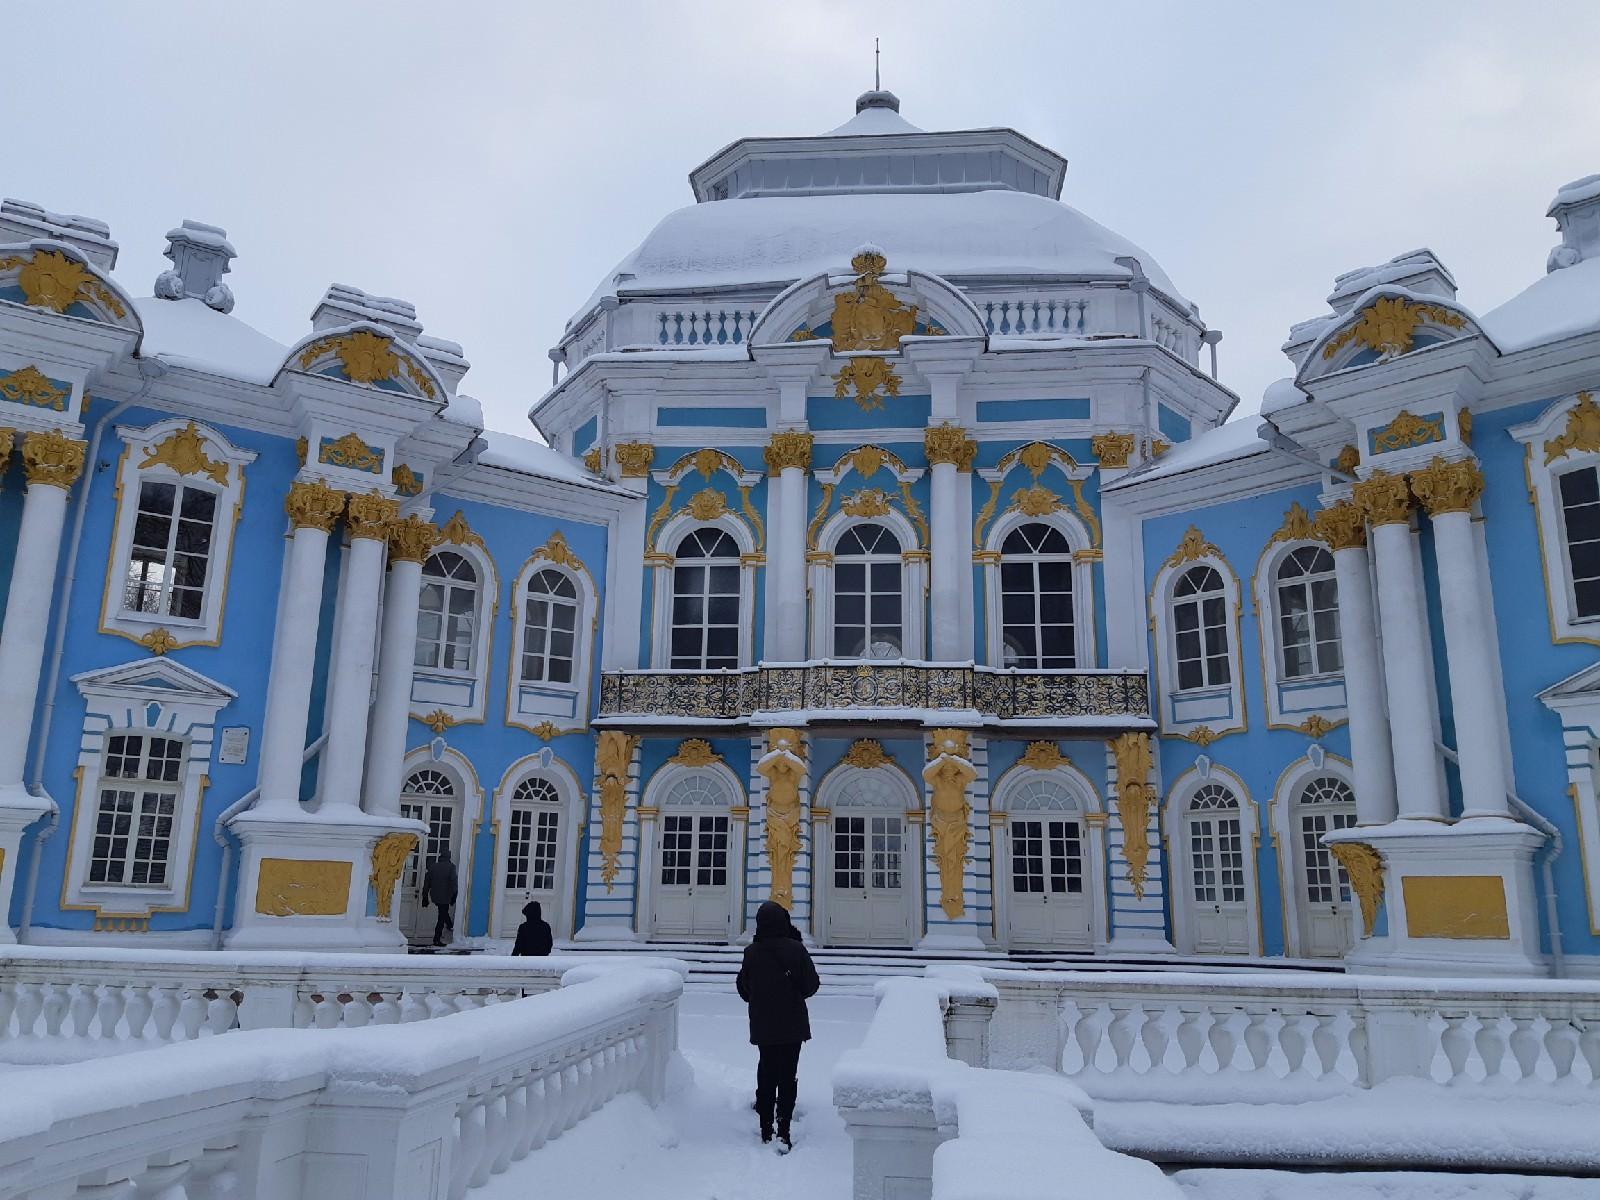 pavillon de l`ermitage a tsarskoye selo ыщгы дф тушпу